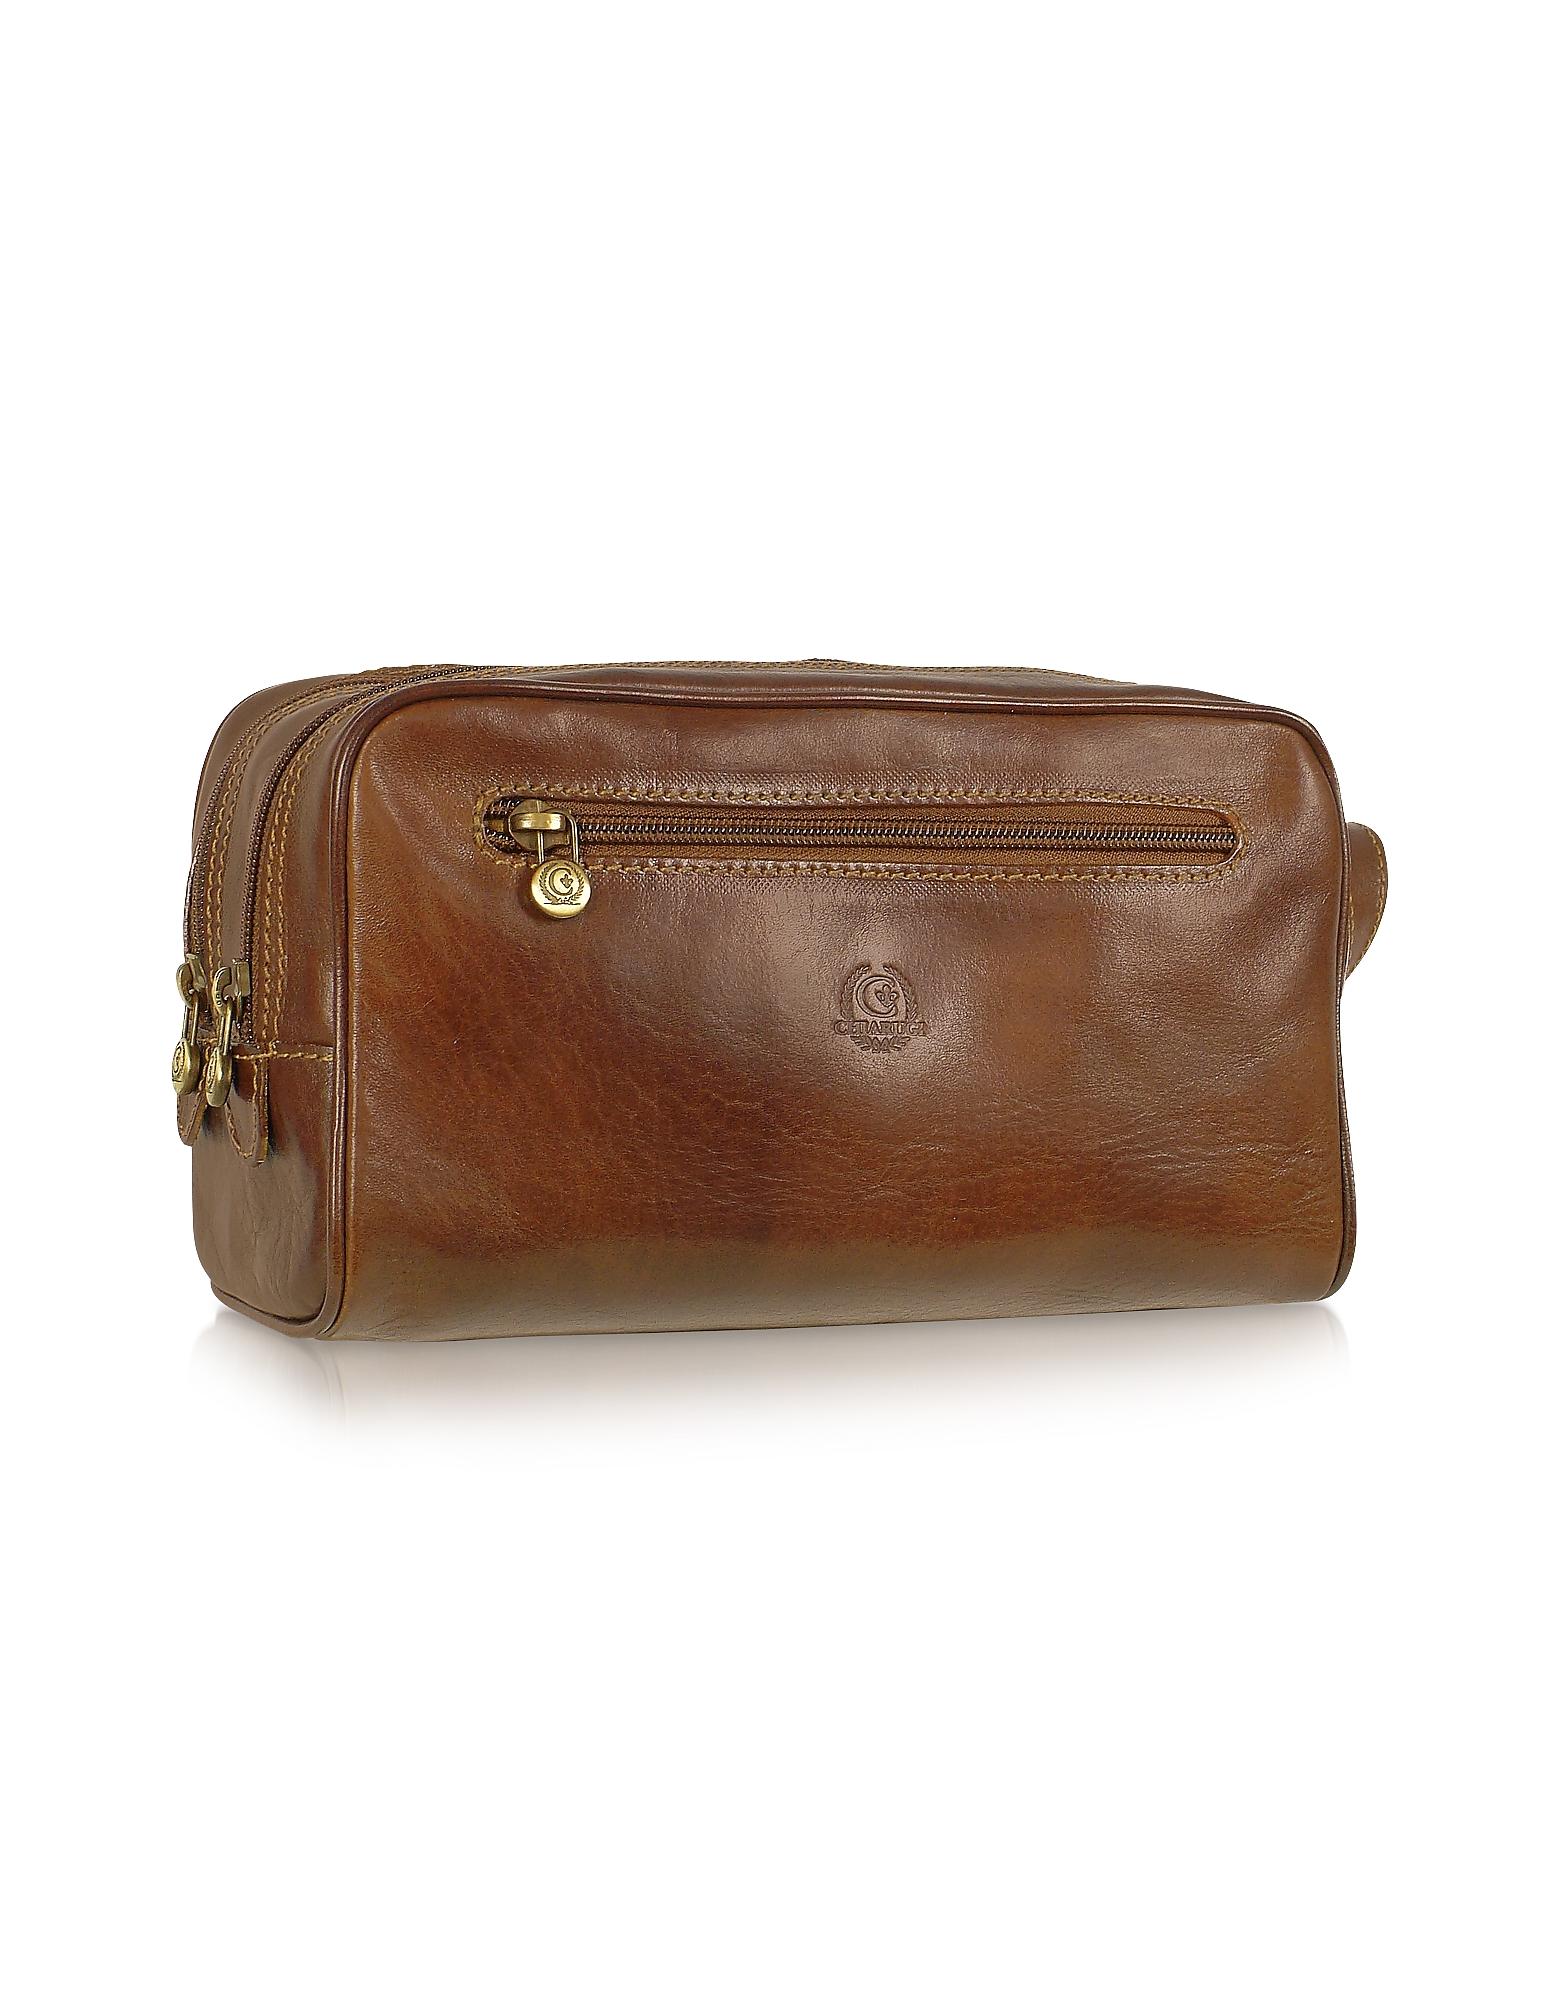 Chiarugi Travel Bags, Handmade Brown Genuine Italian Leather Toiletry Travel Kit